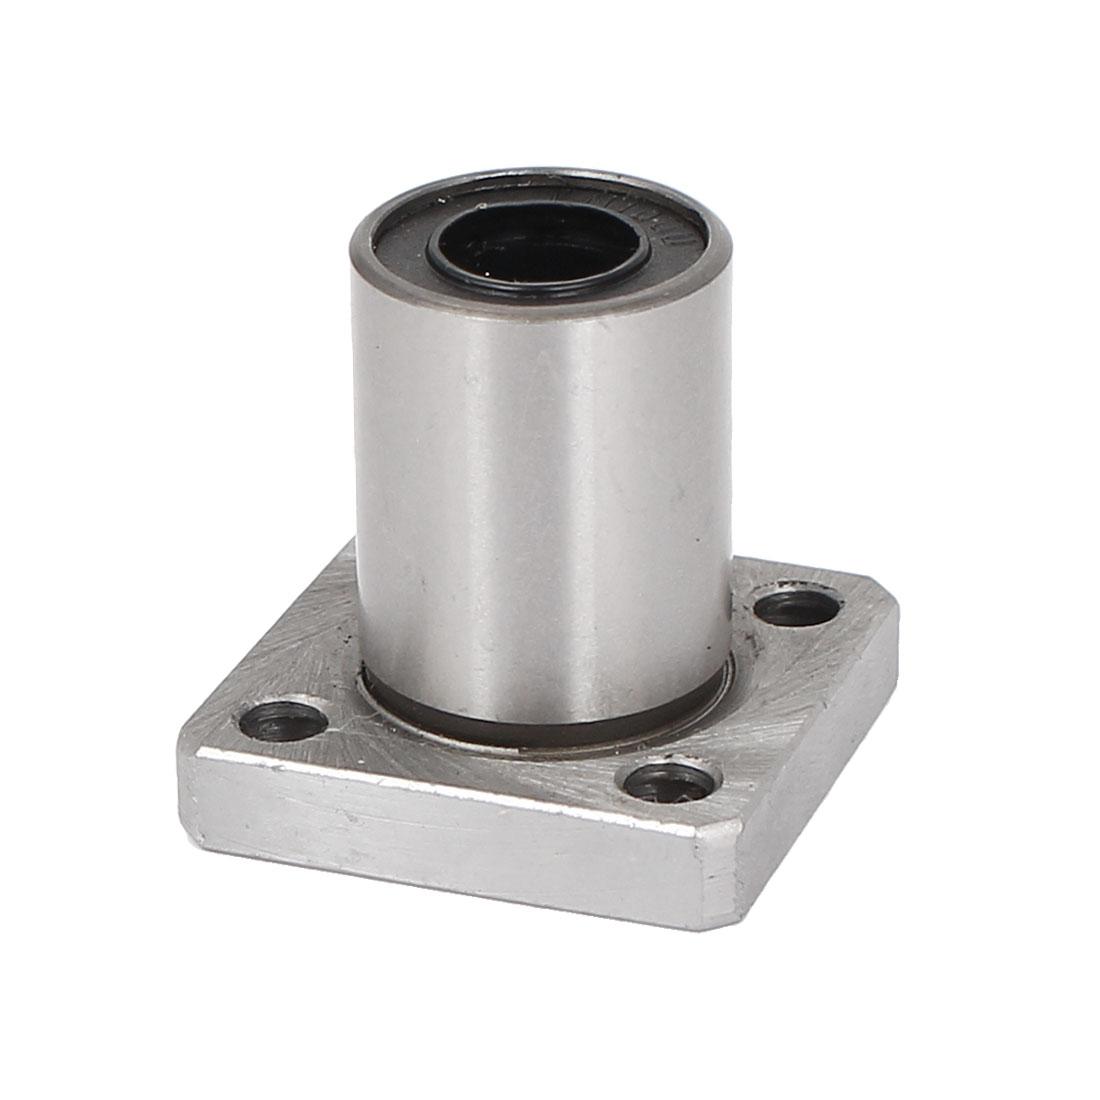 LMK10UU Square Flange Linear Bearing Ball Bushing 19mmx10x29mm